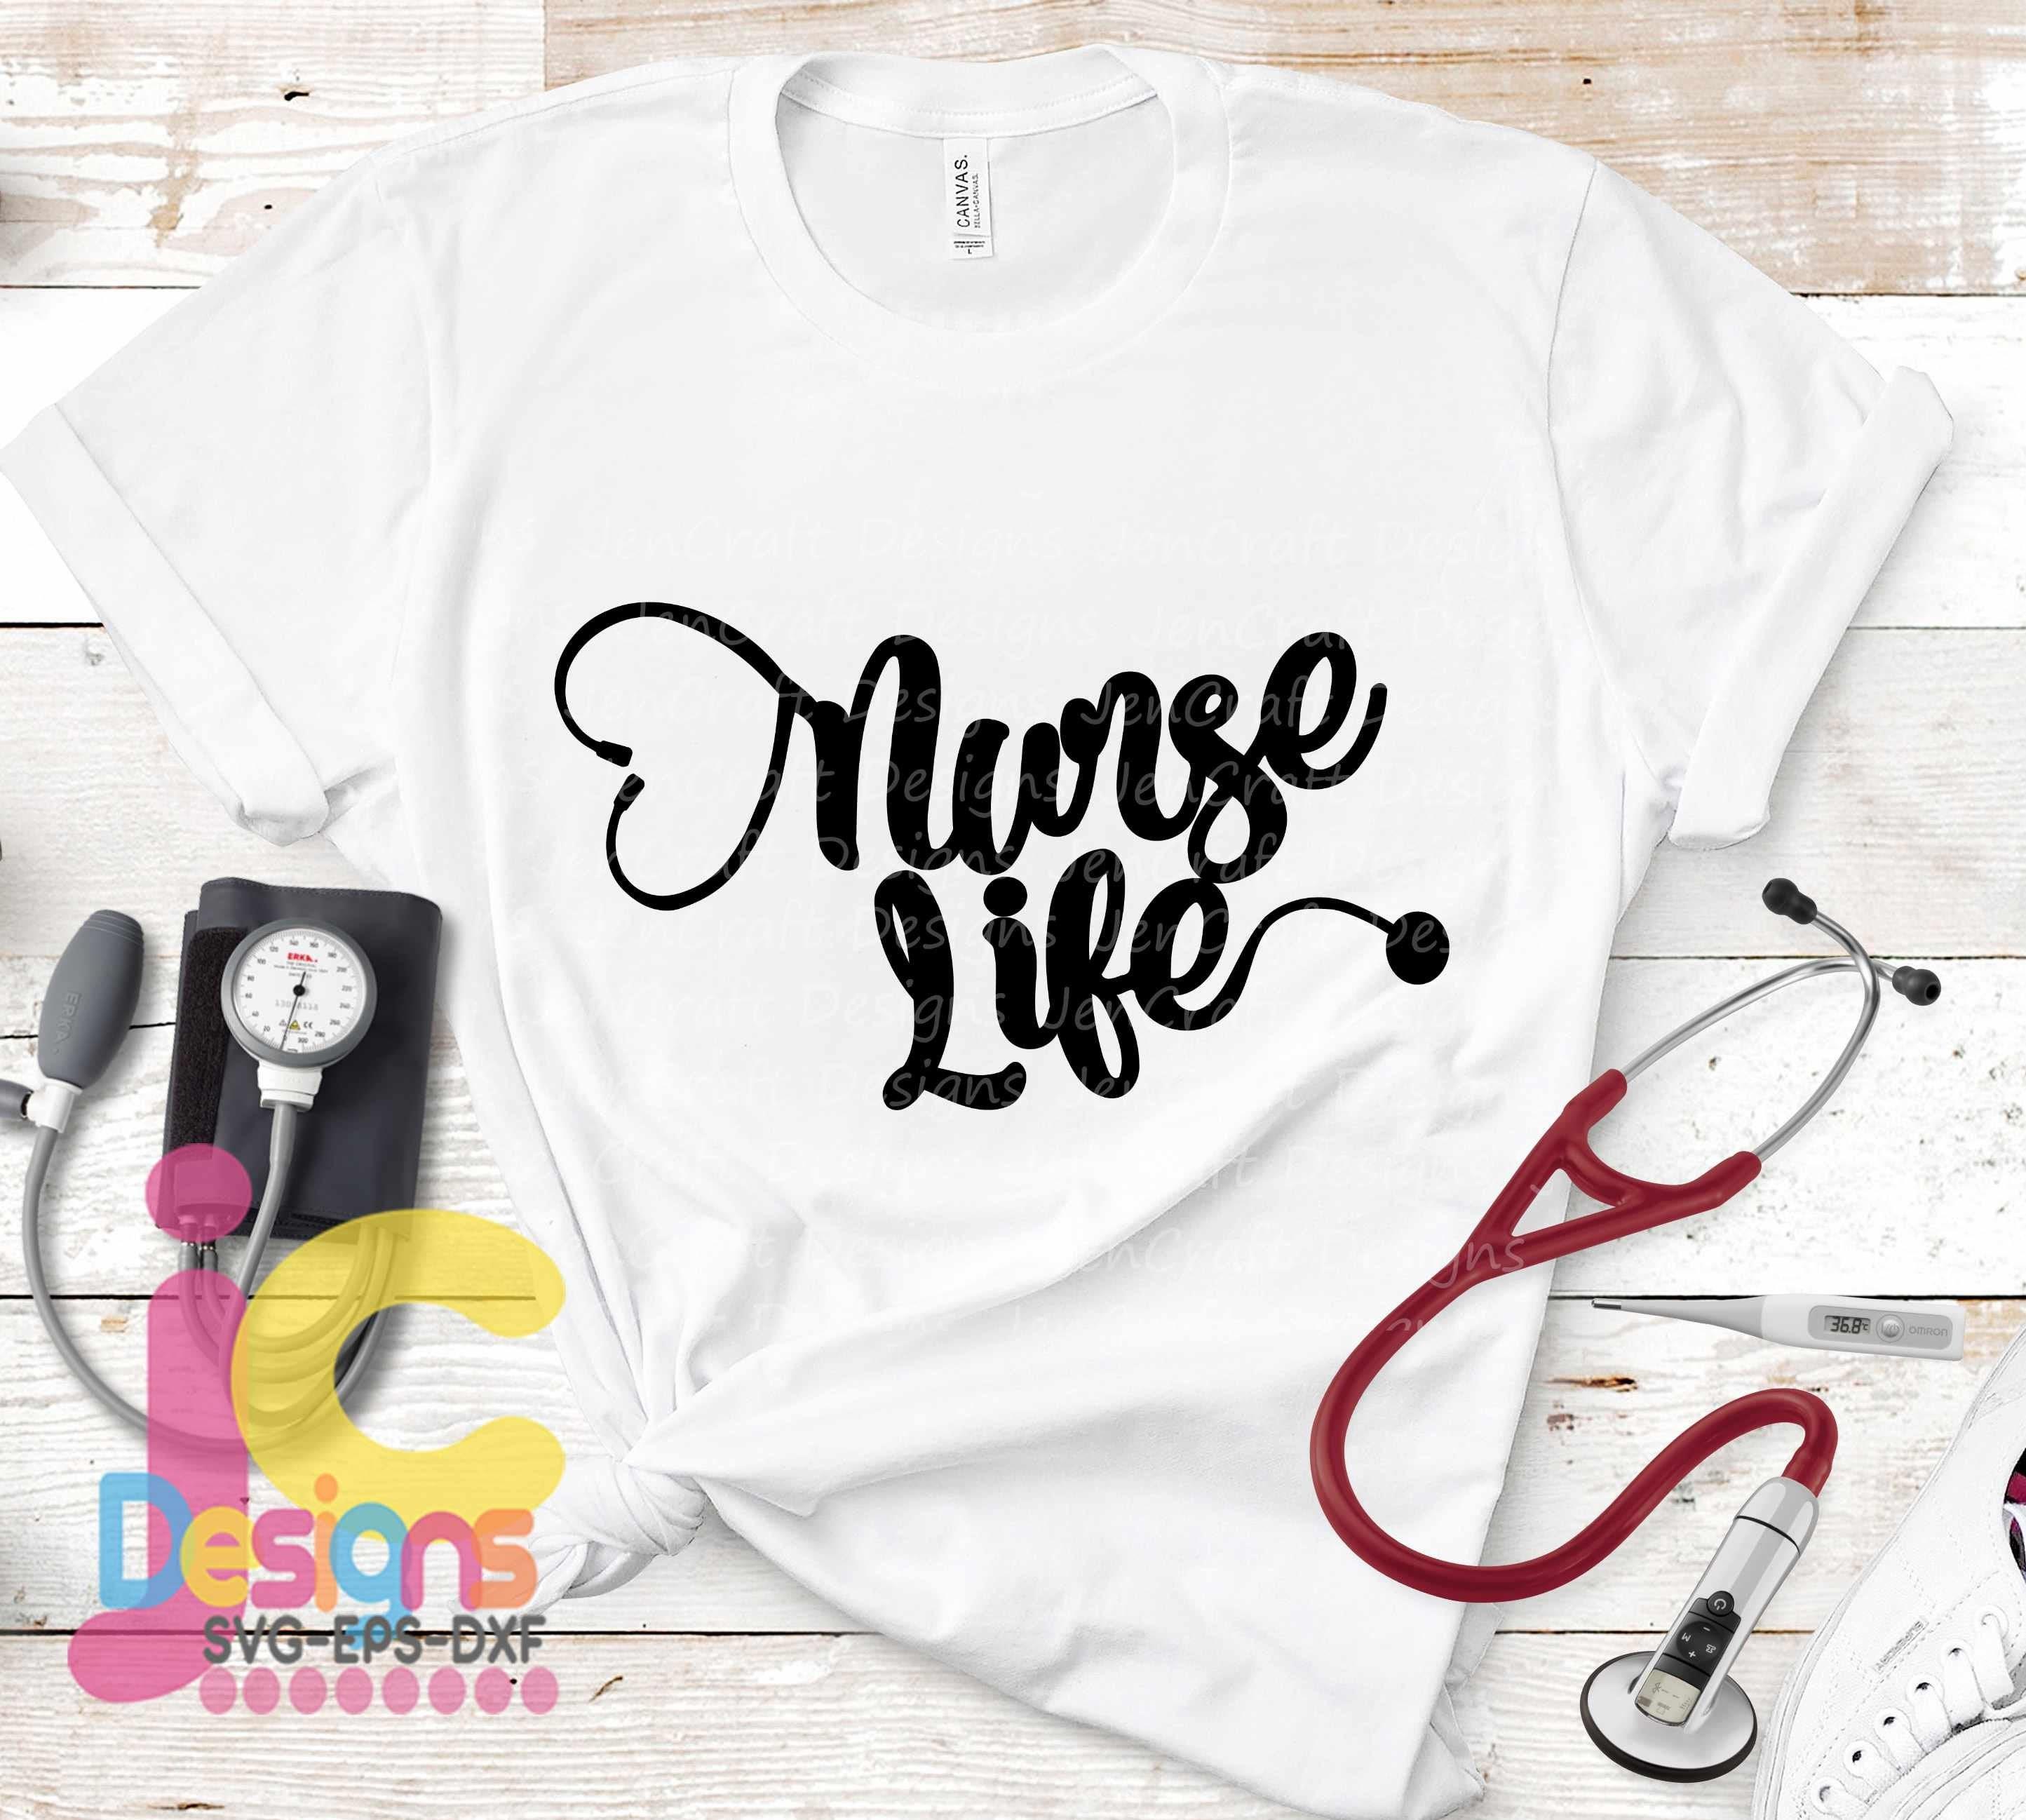 Nurse Life Svg Nursing Png Stethoscope Svg Rn Svg Nurse Appreciation Svg Eps Png Dxf Cut Cricut Silhouette Digital Cut Files